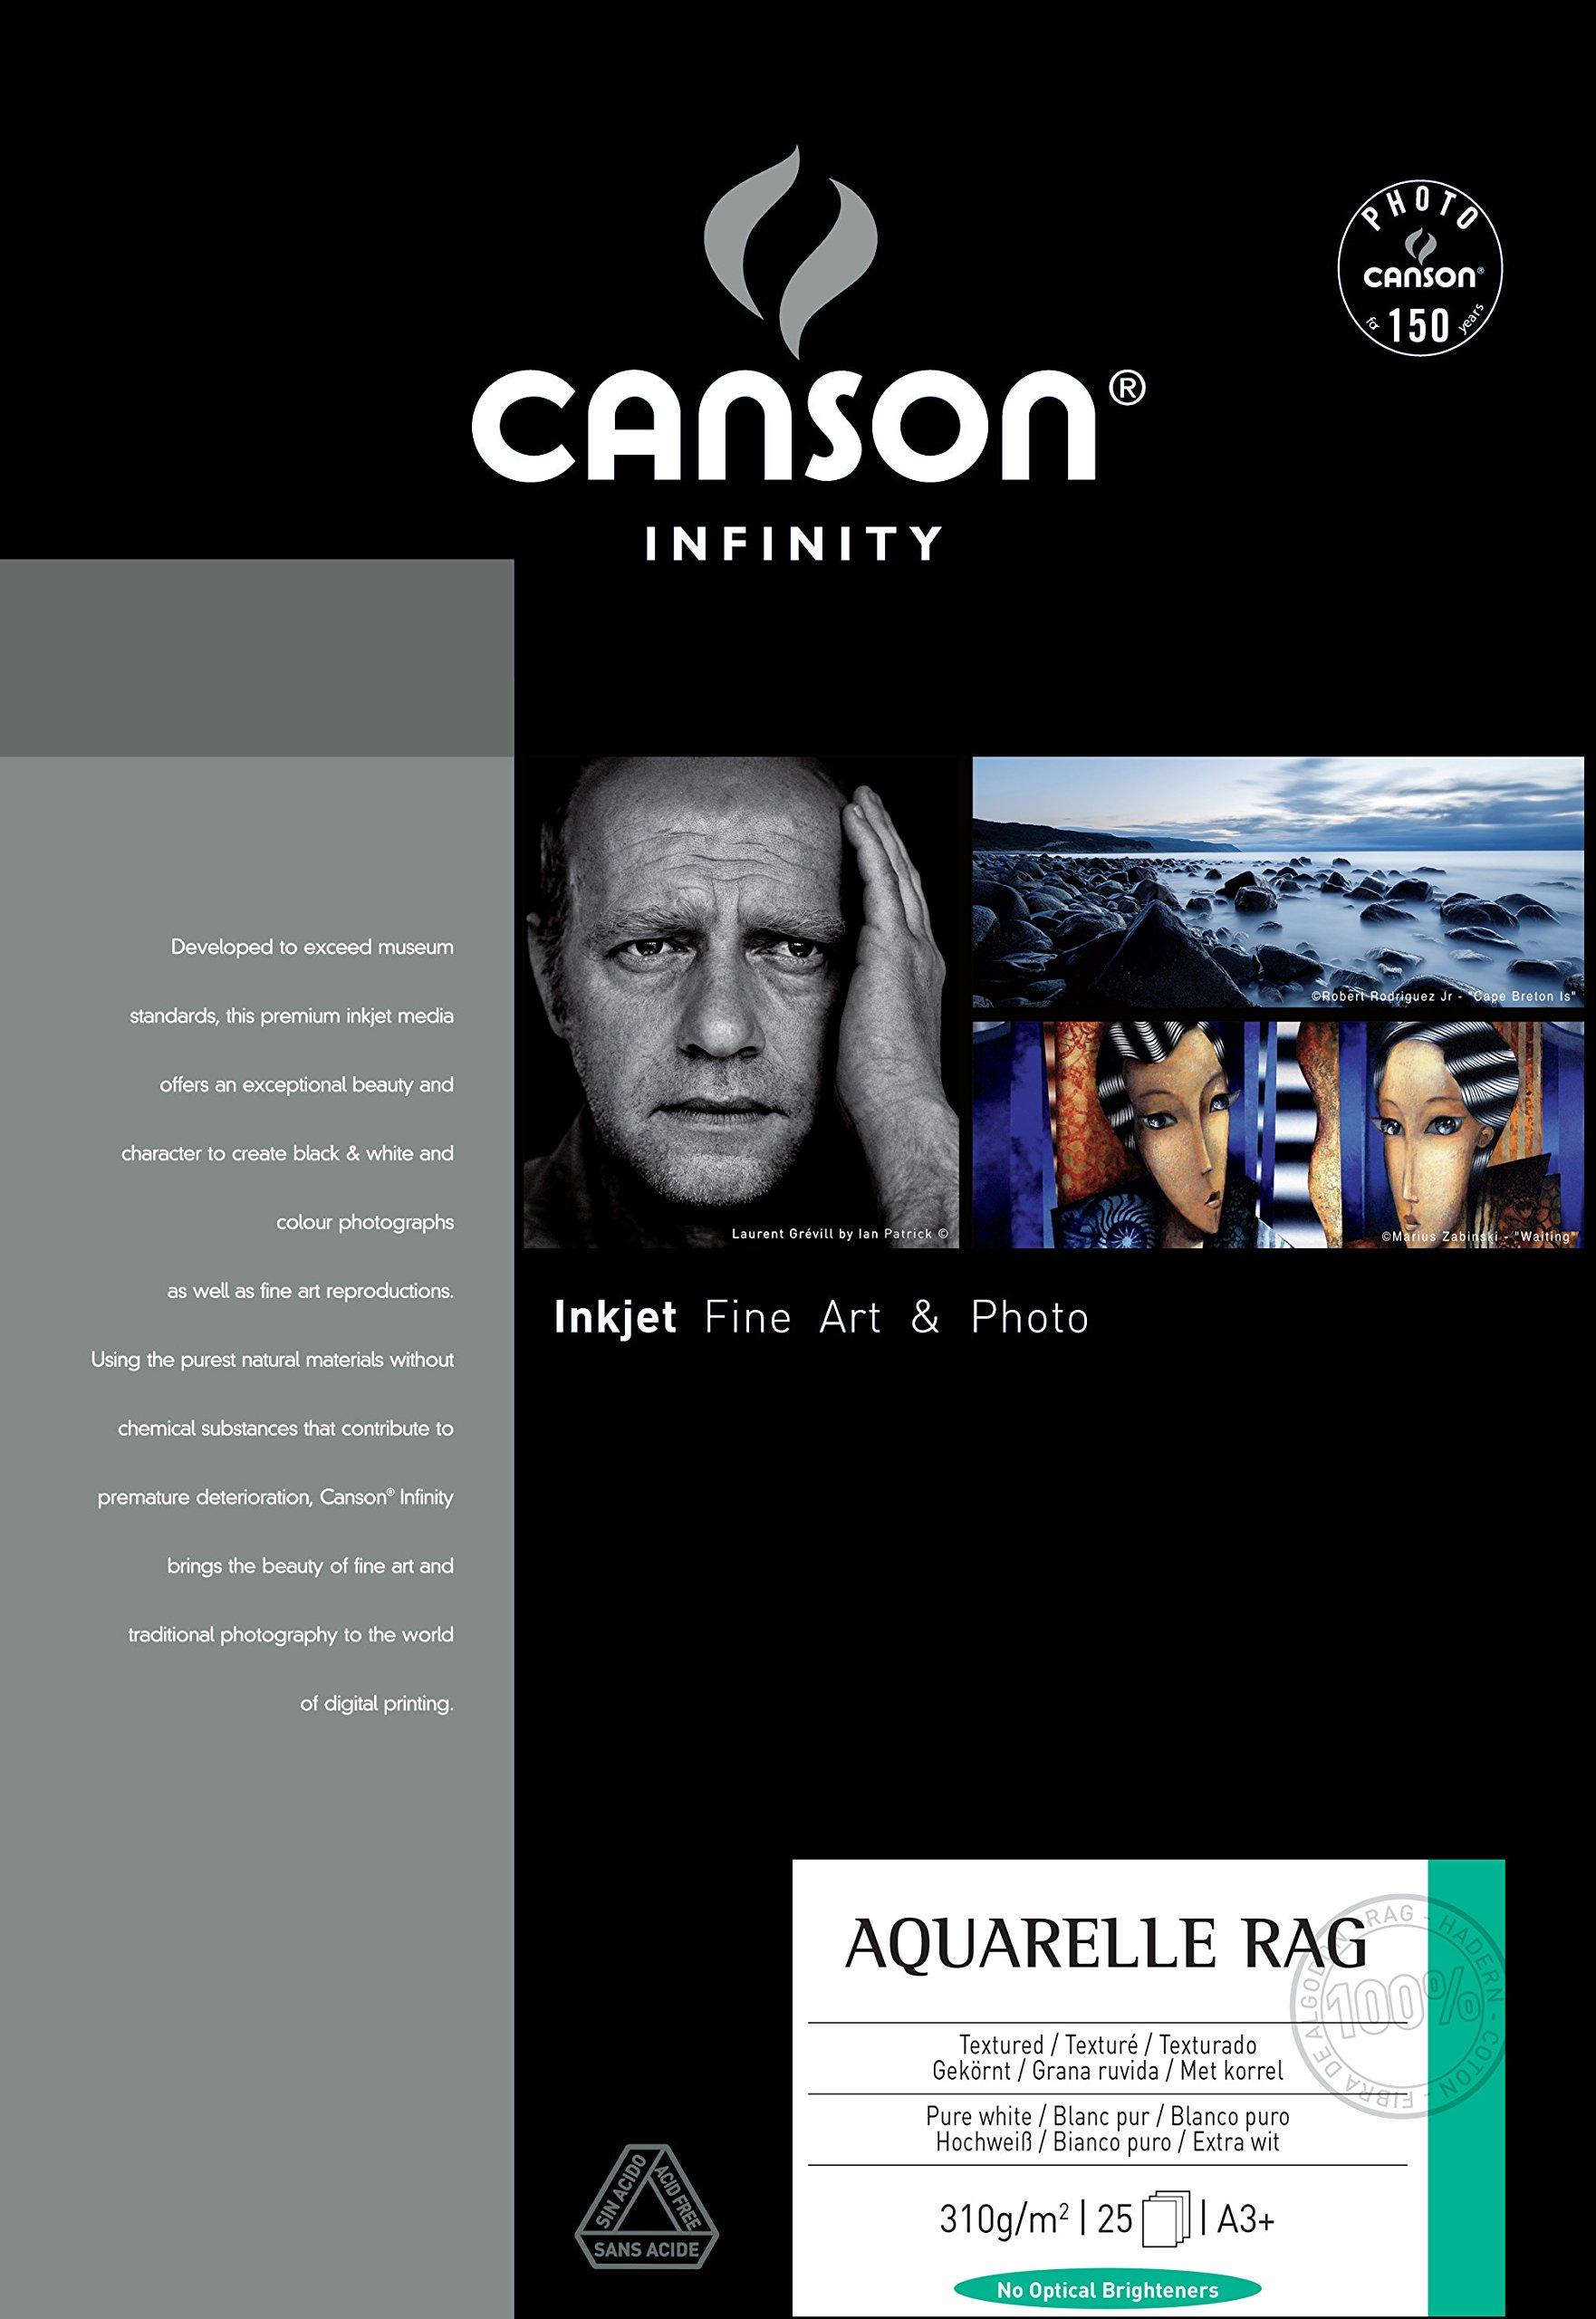 Legion Canson Infinity Digital Paper, Aquarelle Rag 310S, 13 X 19 inches, 25 Sheets A3 (F11-AQR310131925)